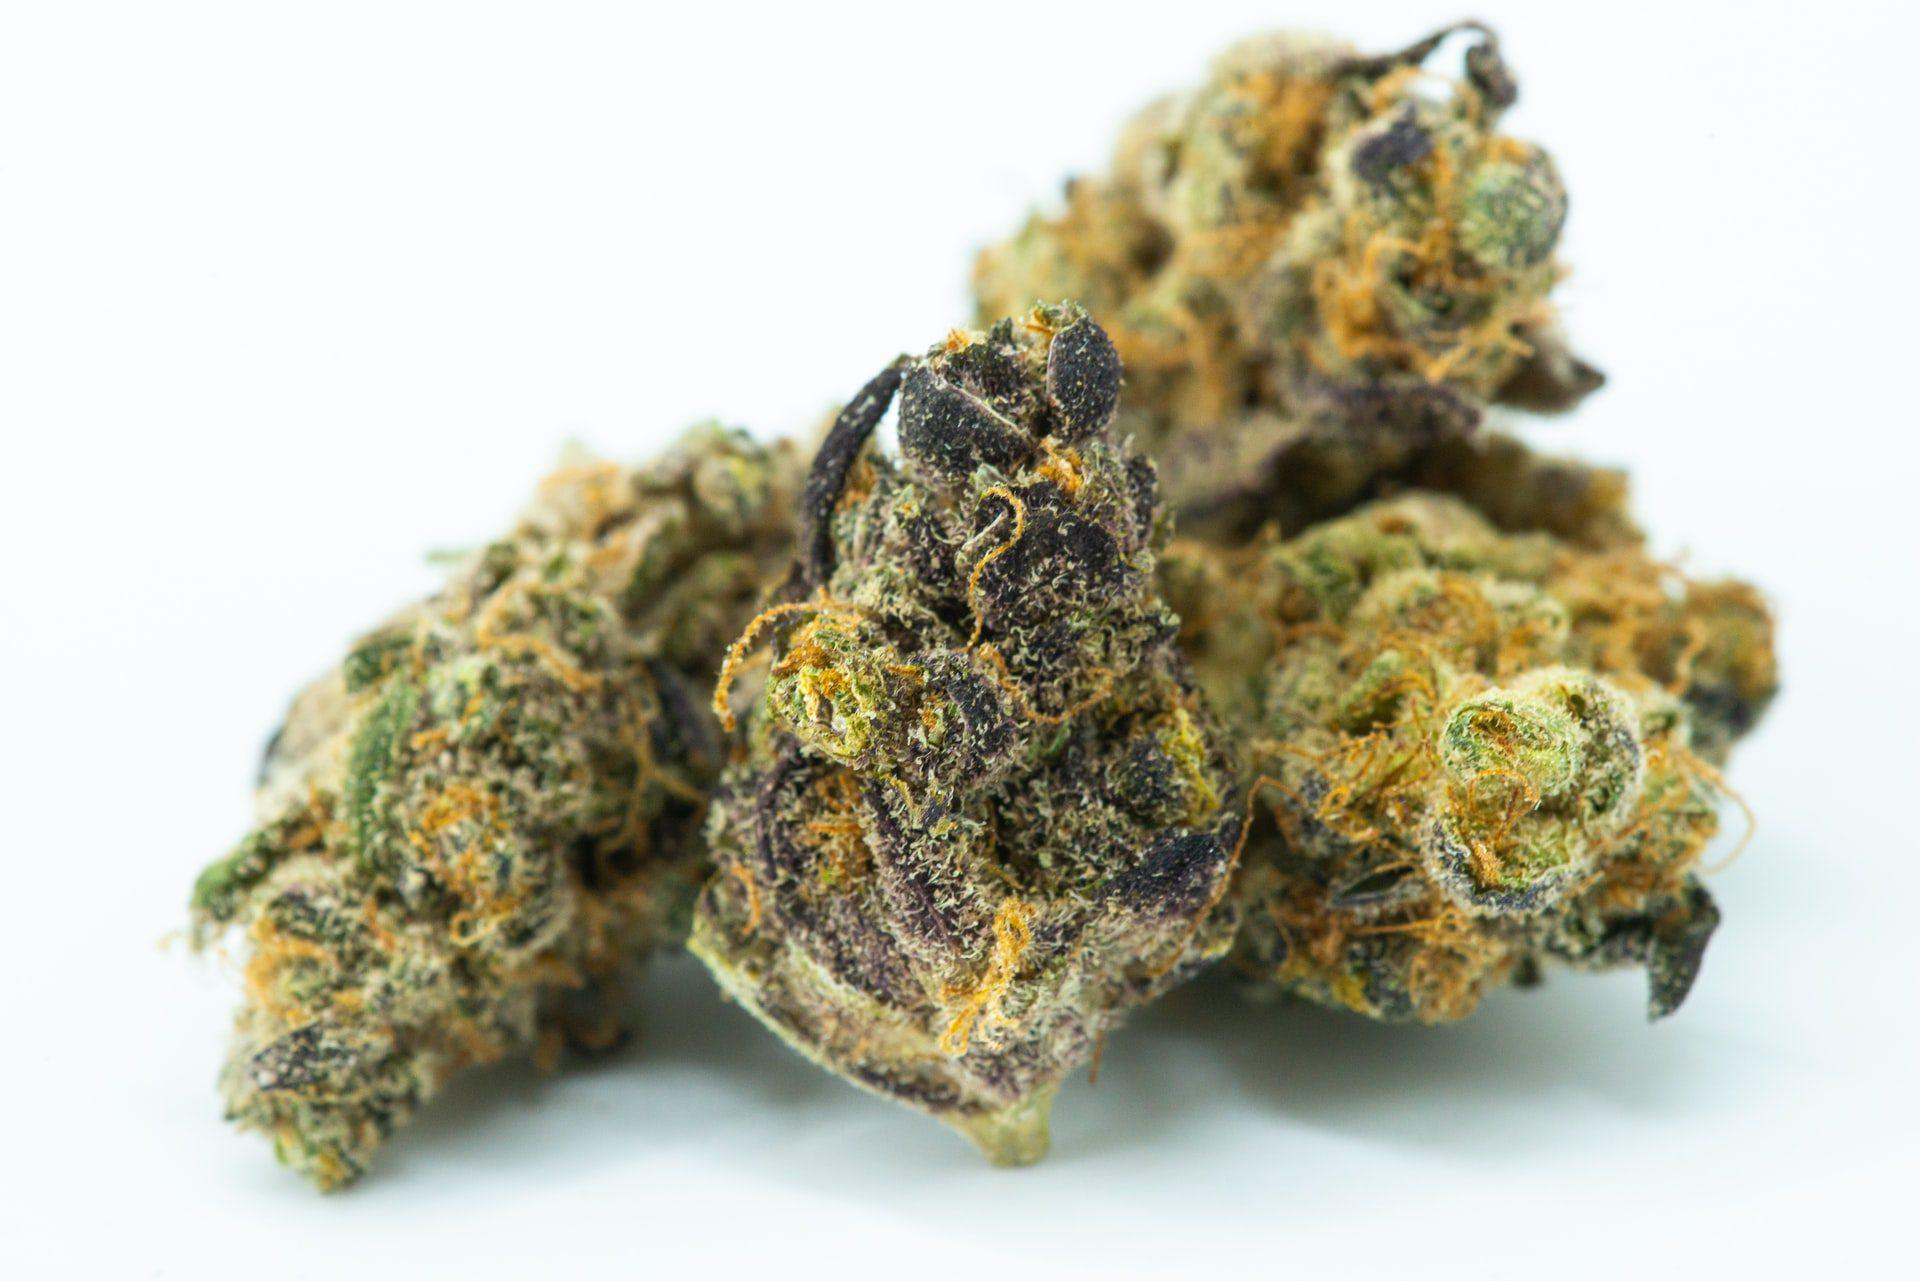 How to Rehydrate Marijuana to Perfection